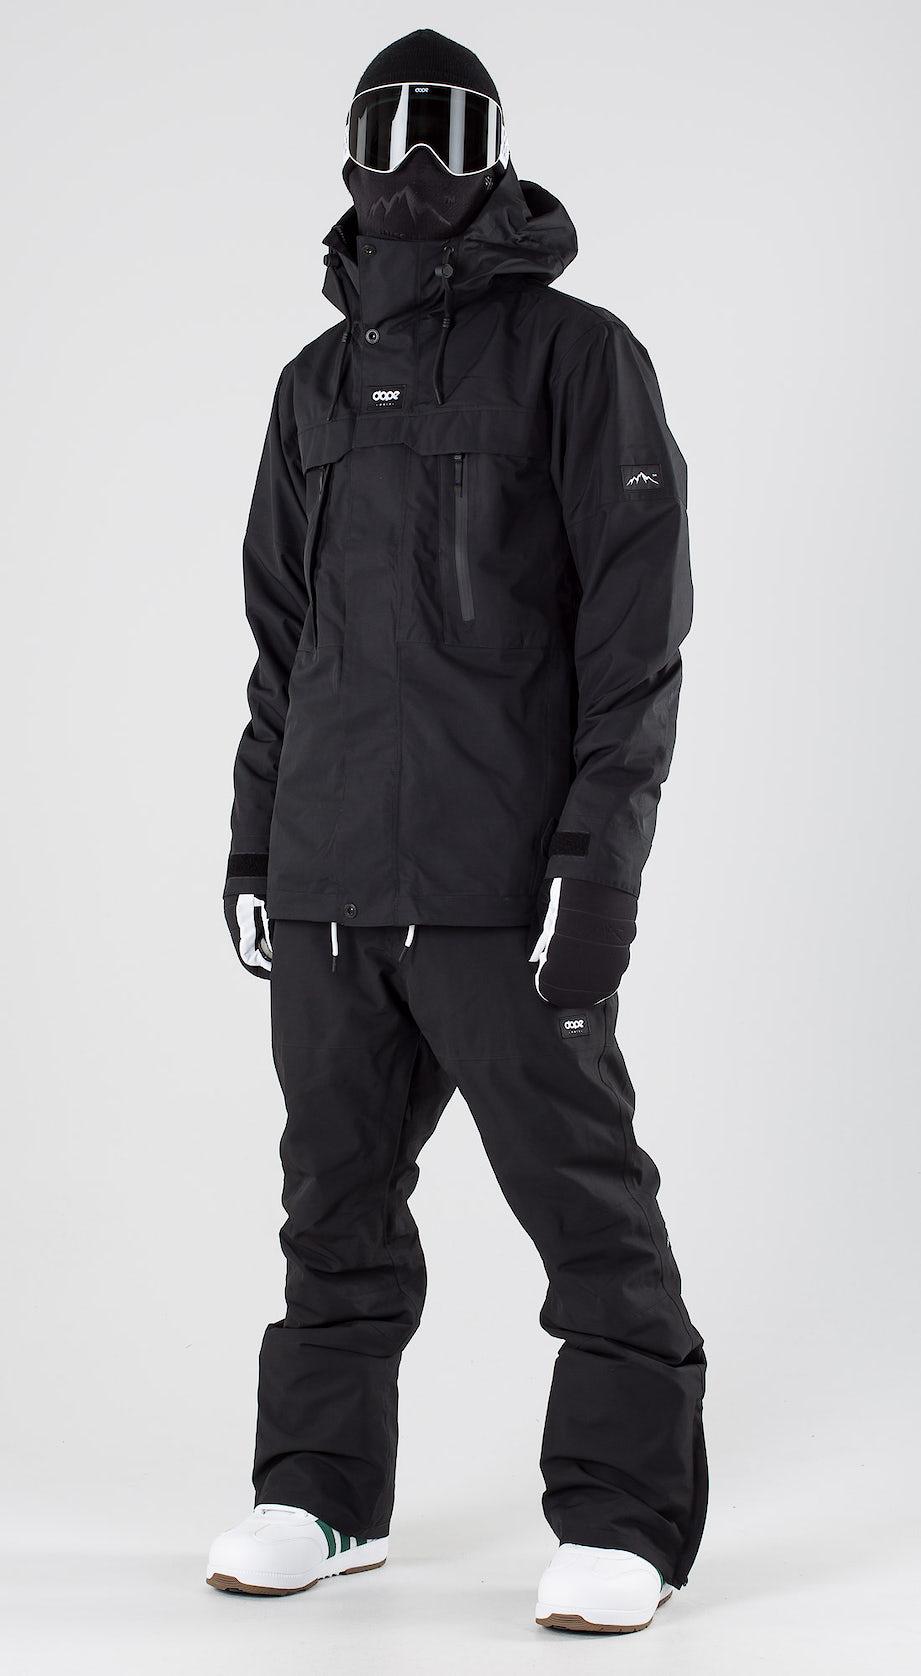 Dope Lunar Black Snowboard clothing Multi